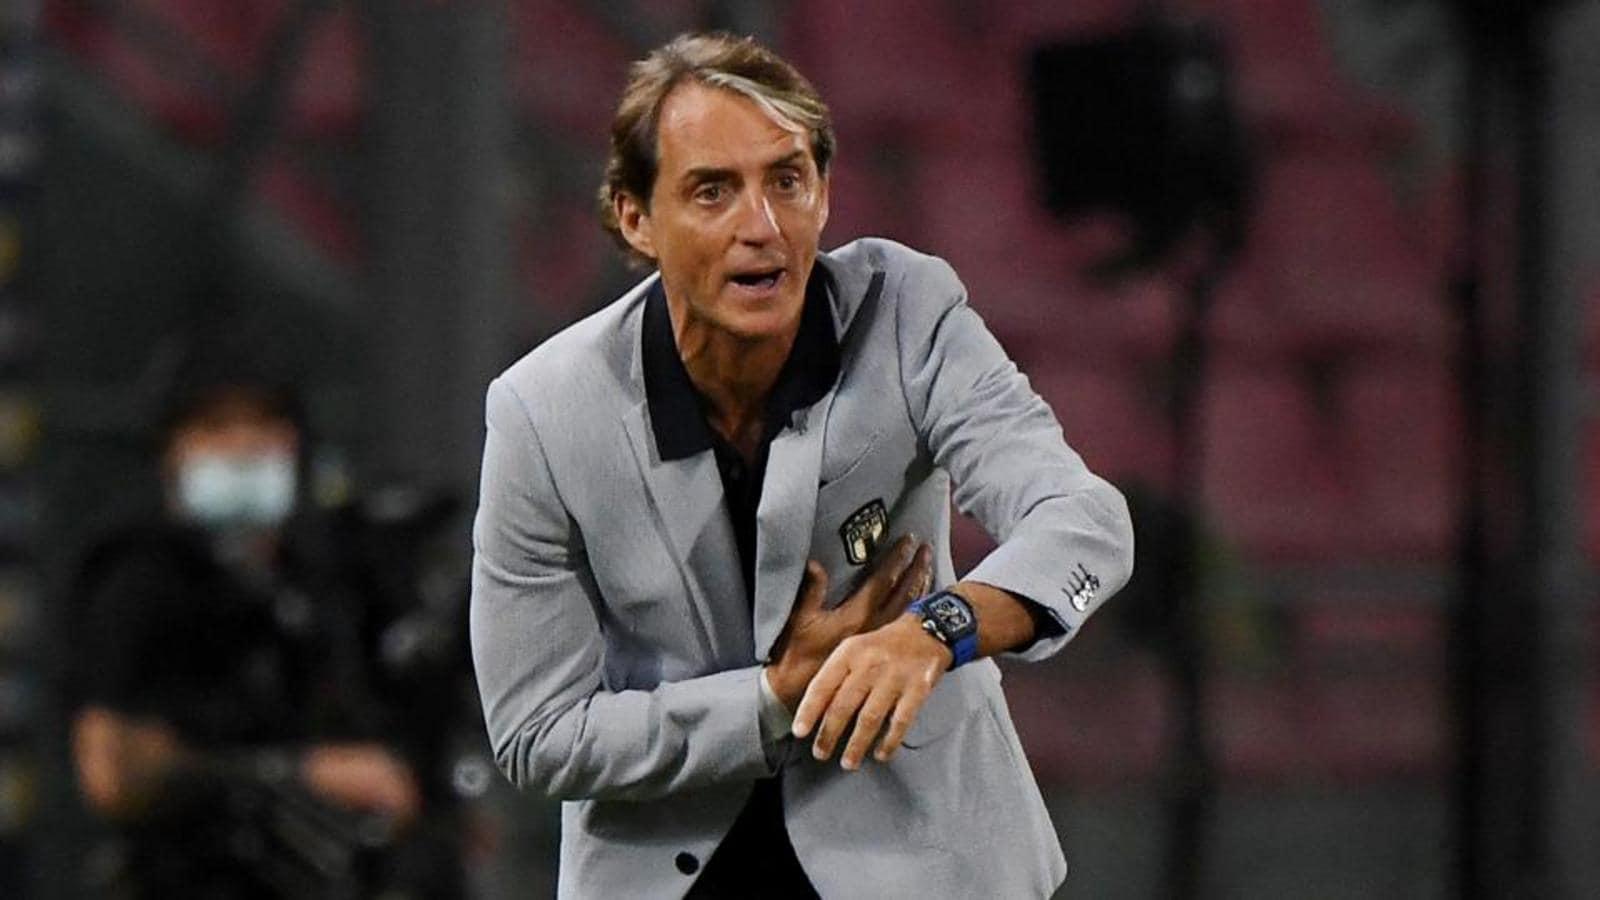 Ballon d' Or: Roberto Mancini names player who should win award this year